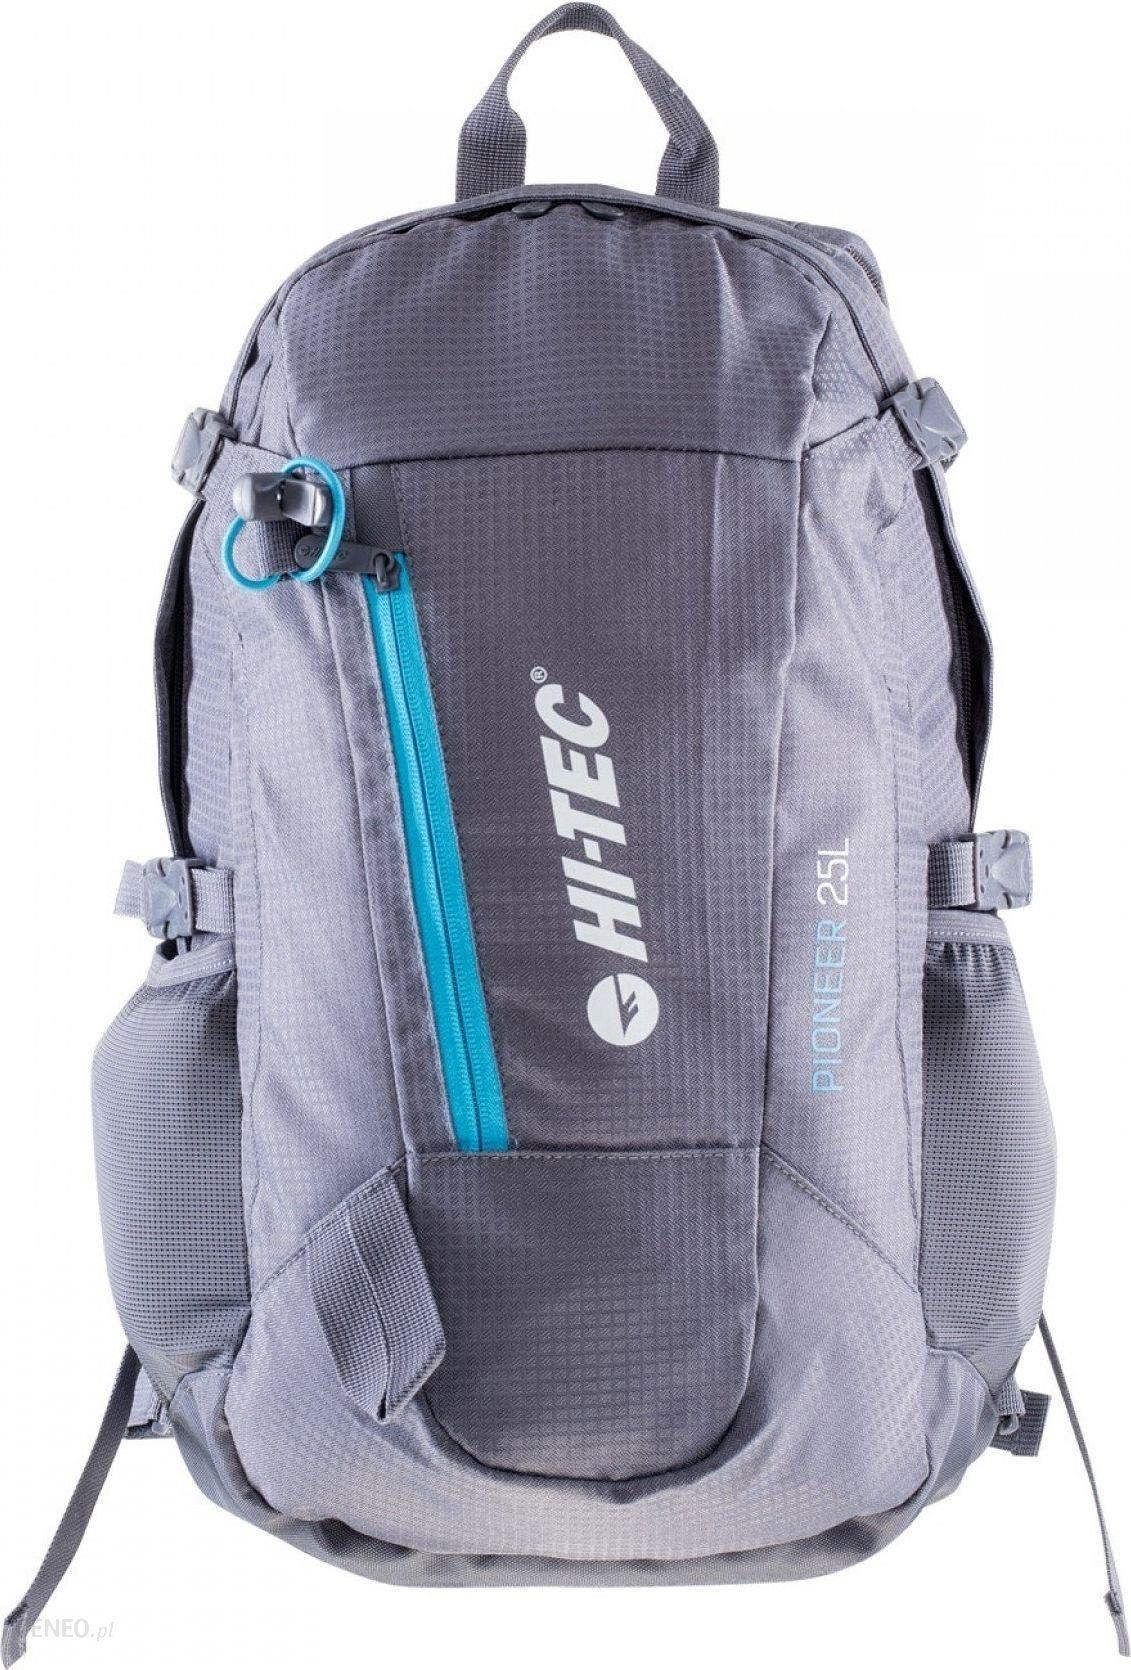 3f9a4be5bd37c Plecak Hi Tec Sportowy Felix 25L Grey Blue - Ceny i opinie - Ceneo.pl